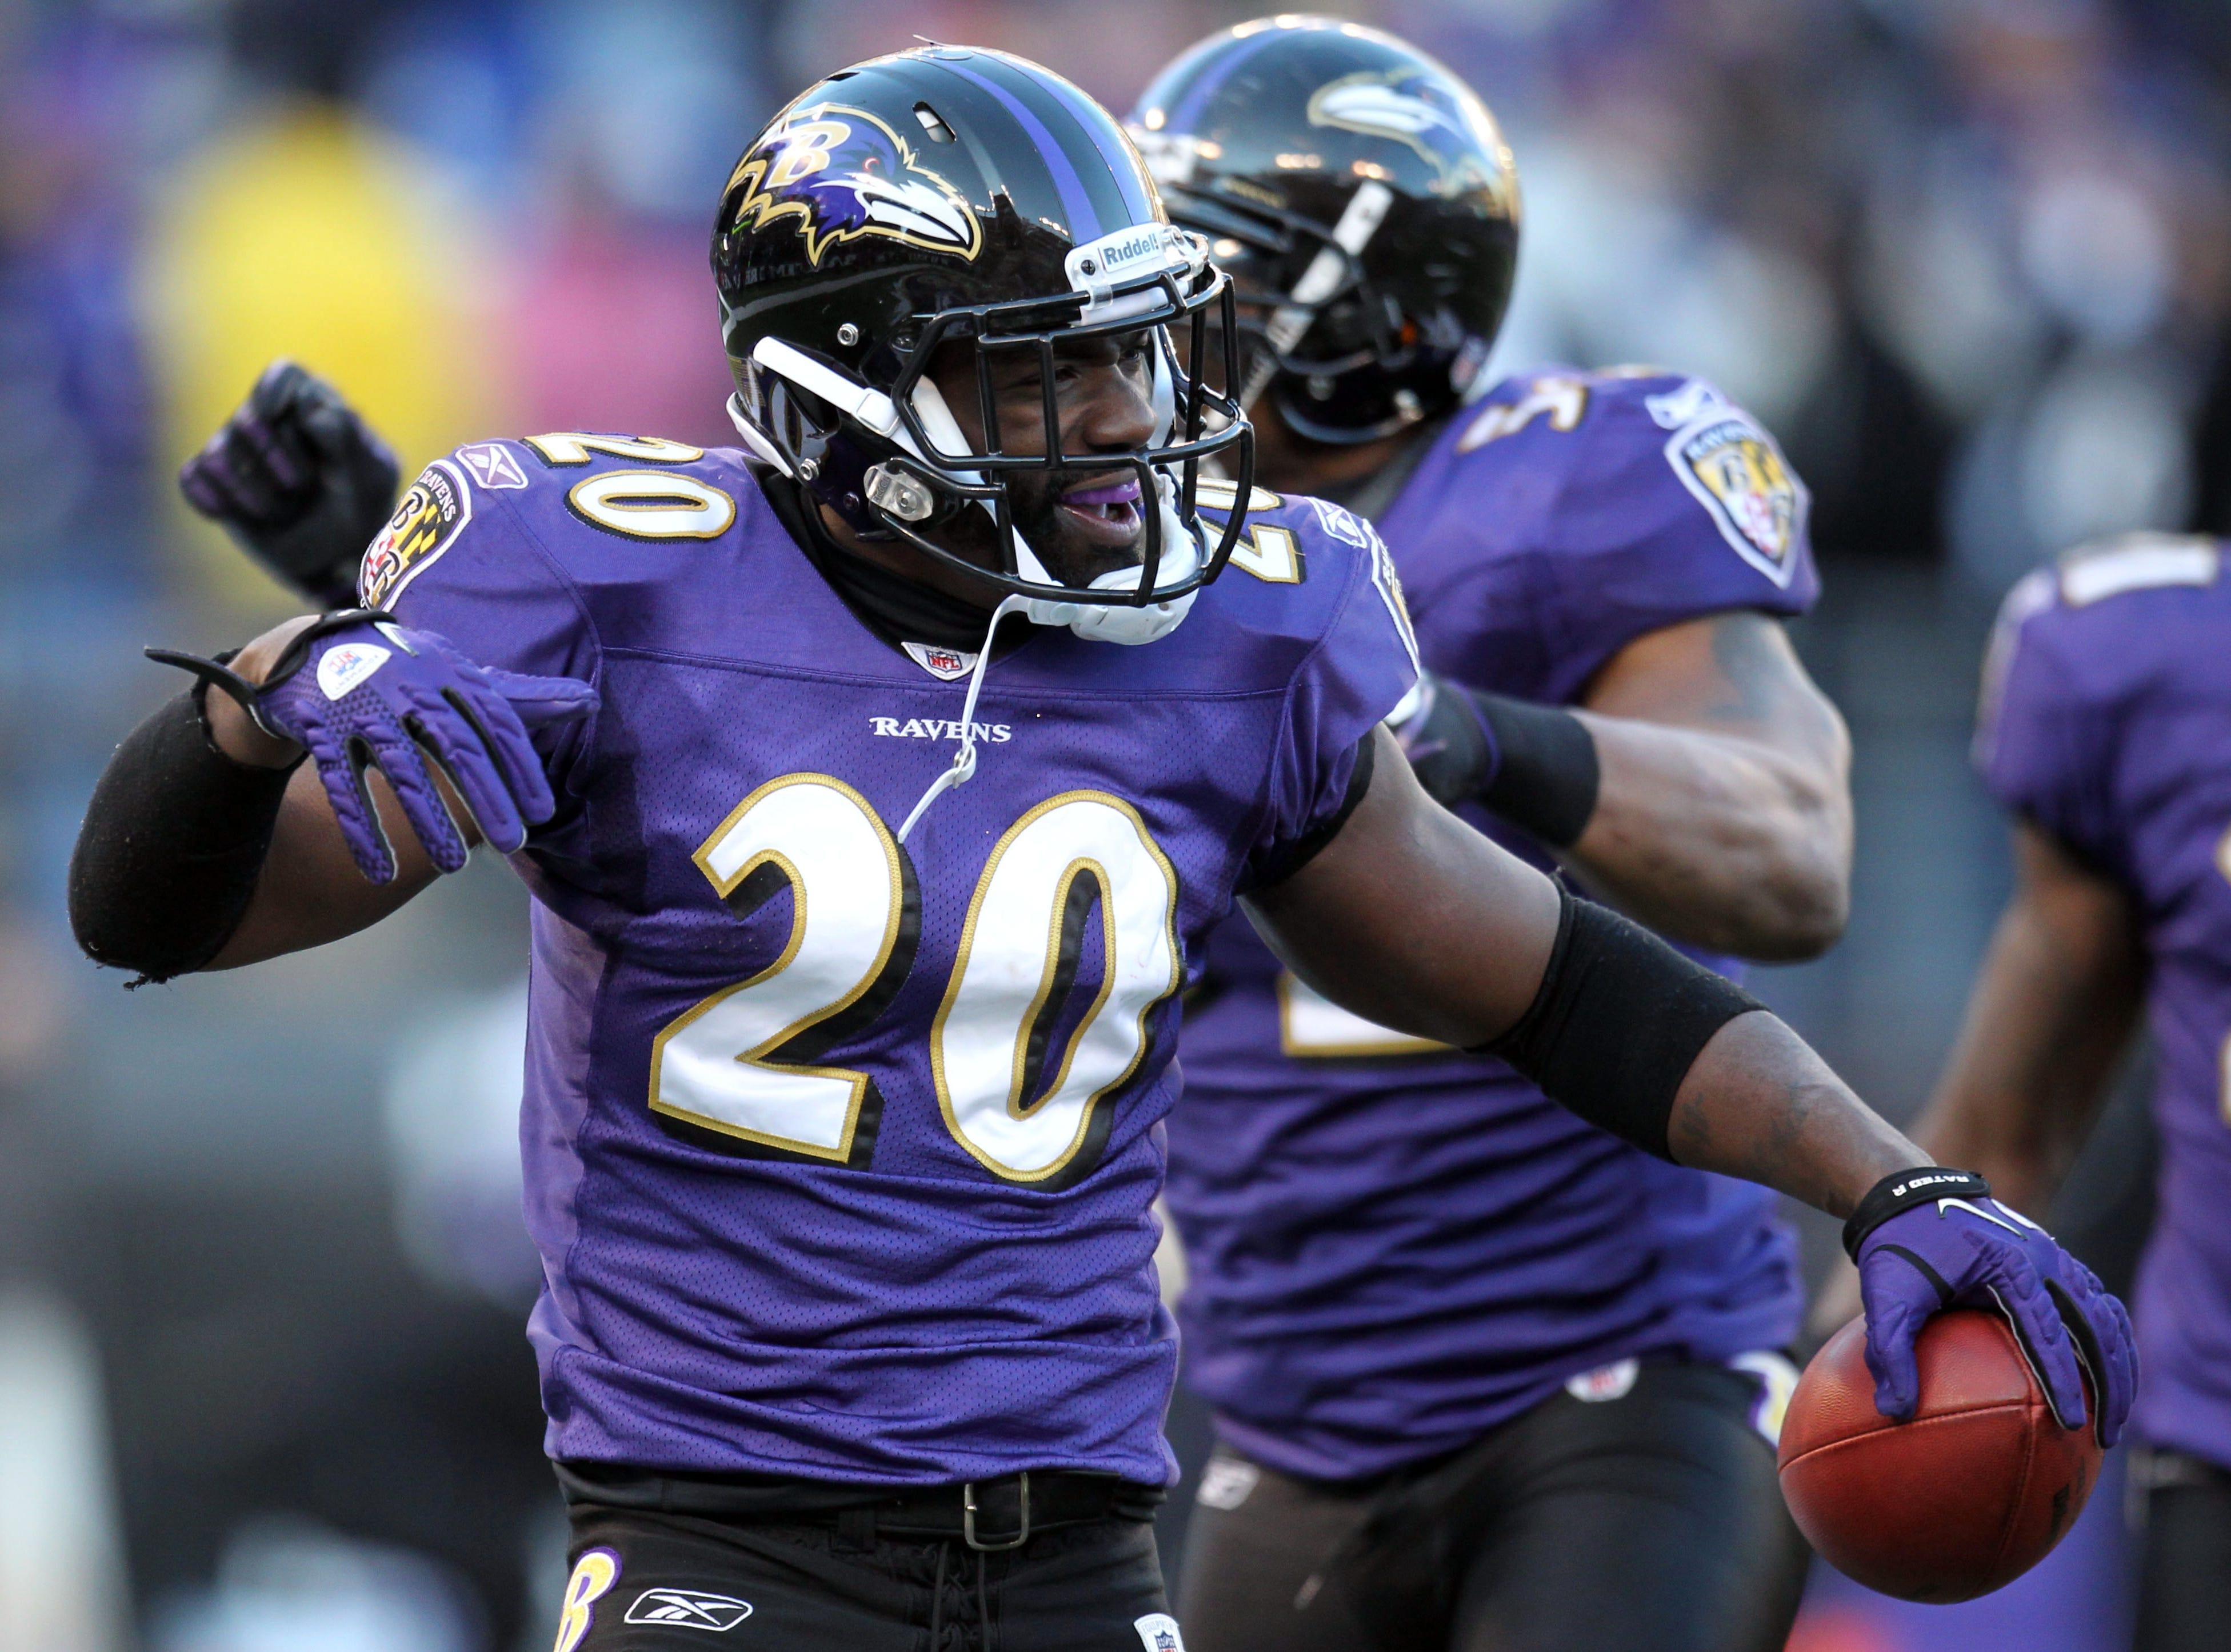 Ed Reed, FS – 2002-2012 Baltimore Ravens, 2013 New York Jets, 2013 Houston Texans